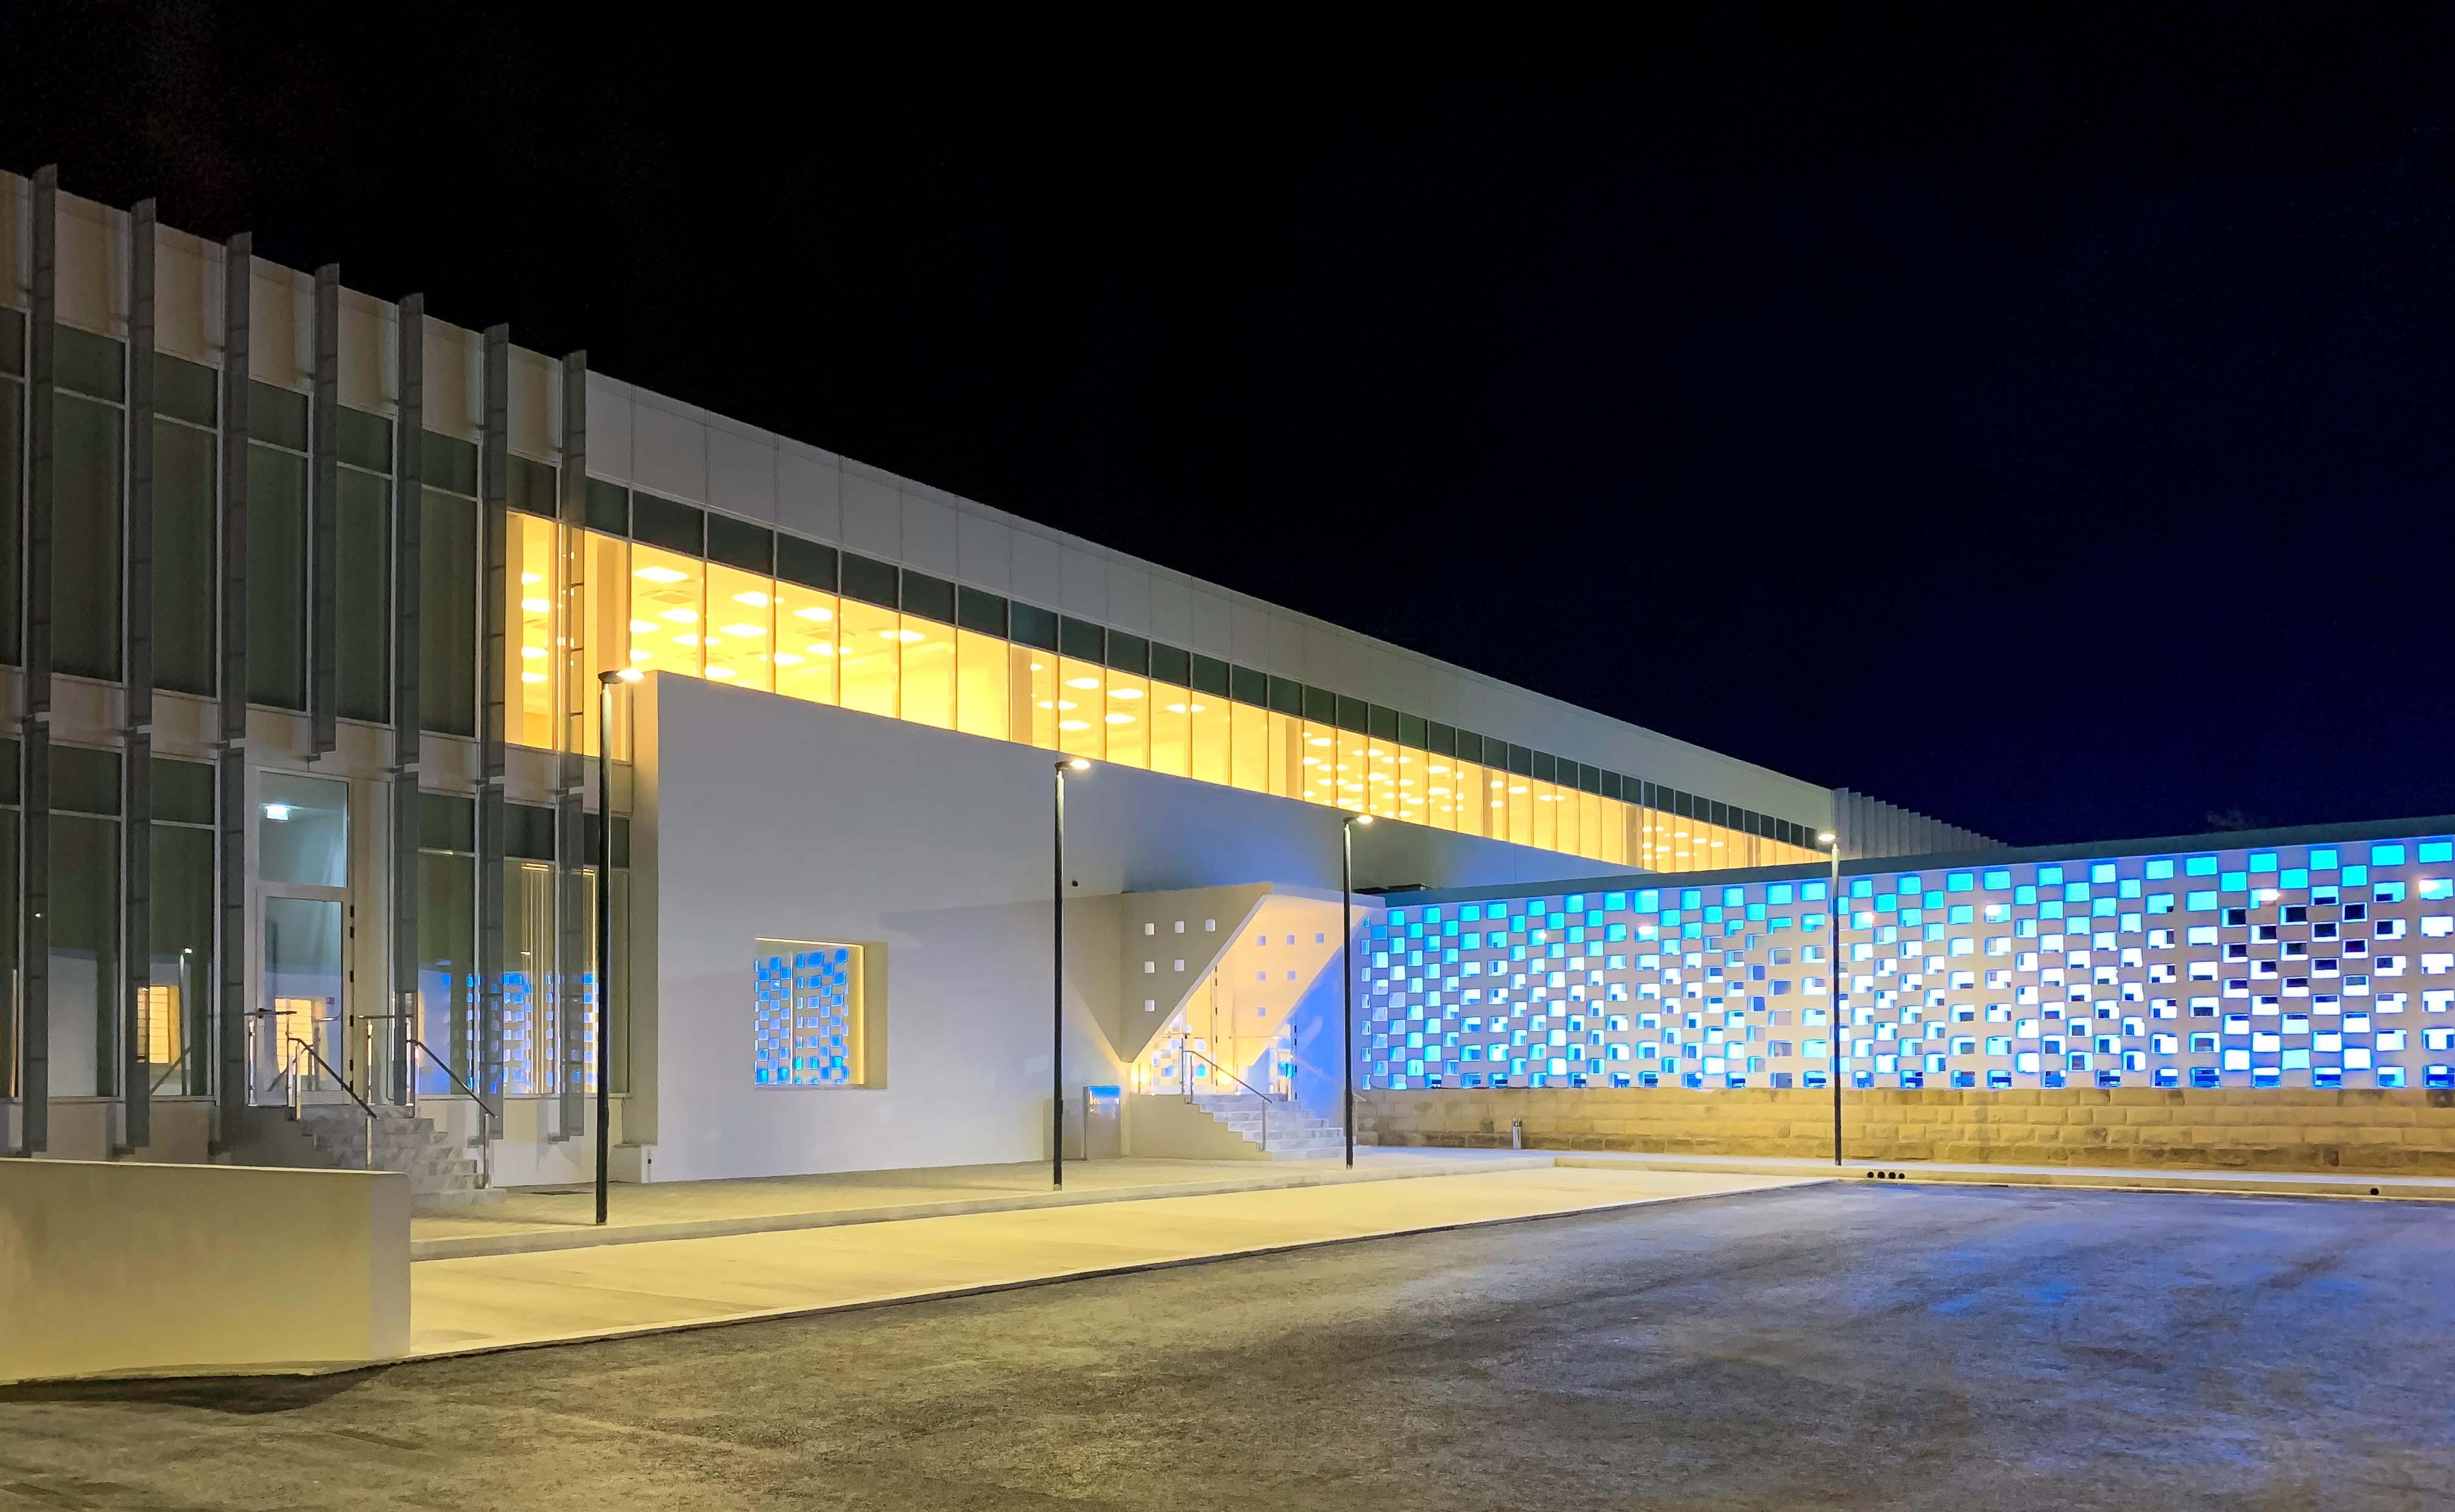 Business centre at night Kurt Borg Coppini